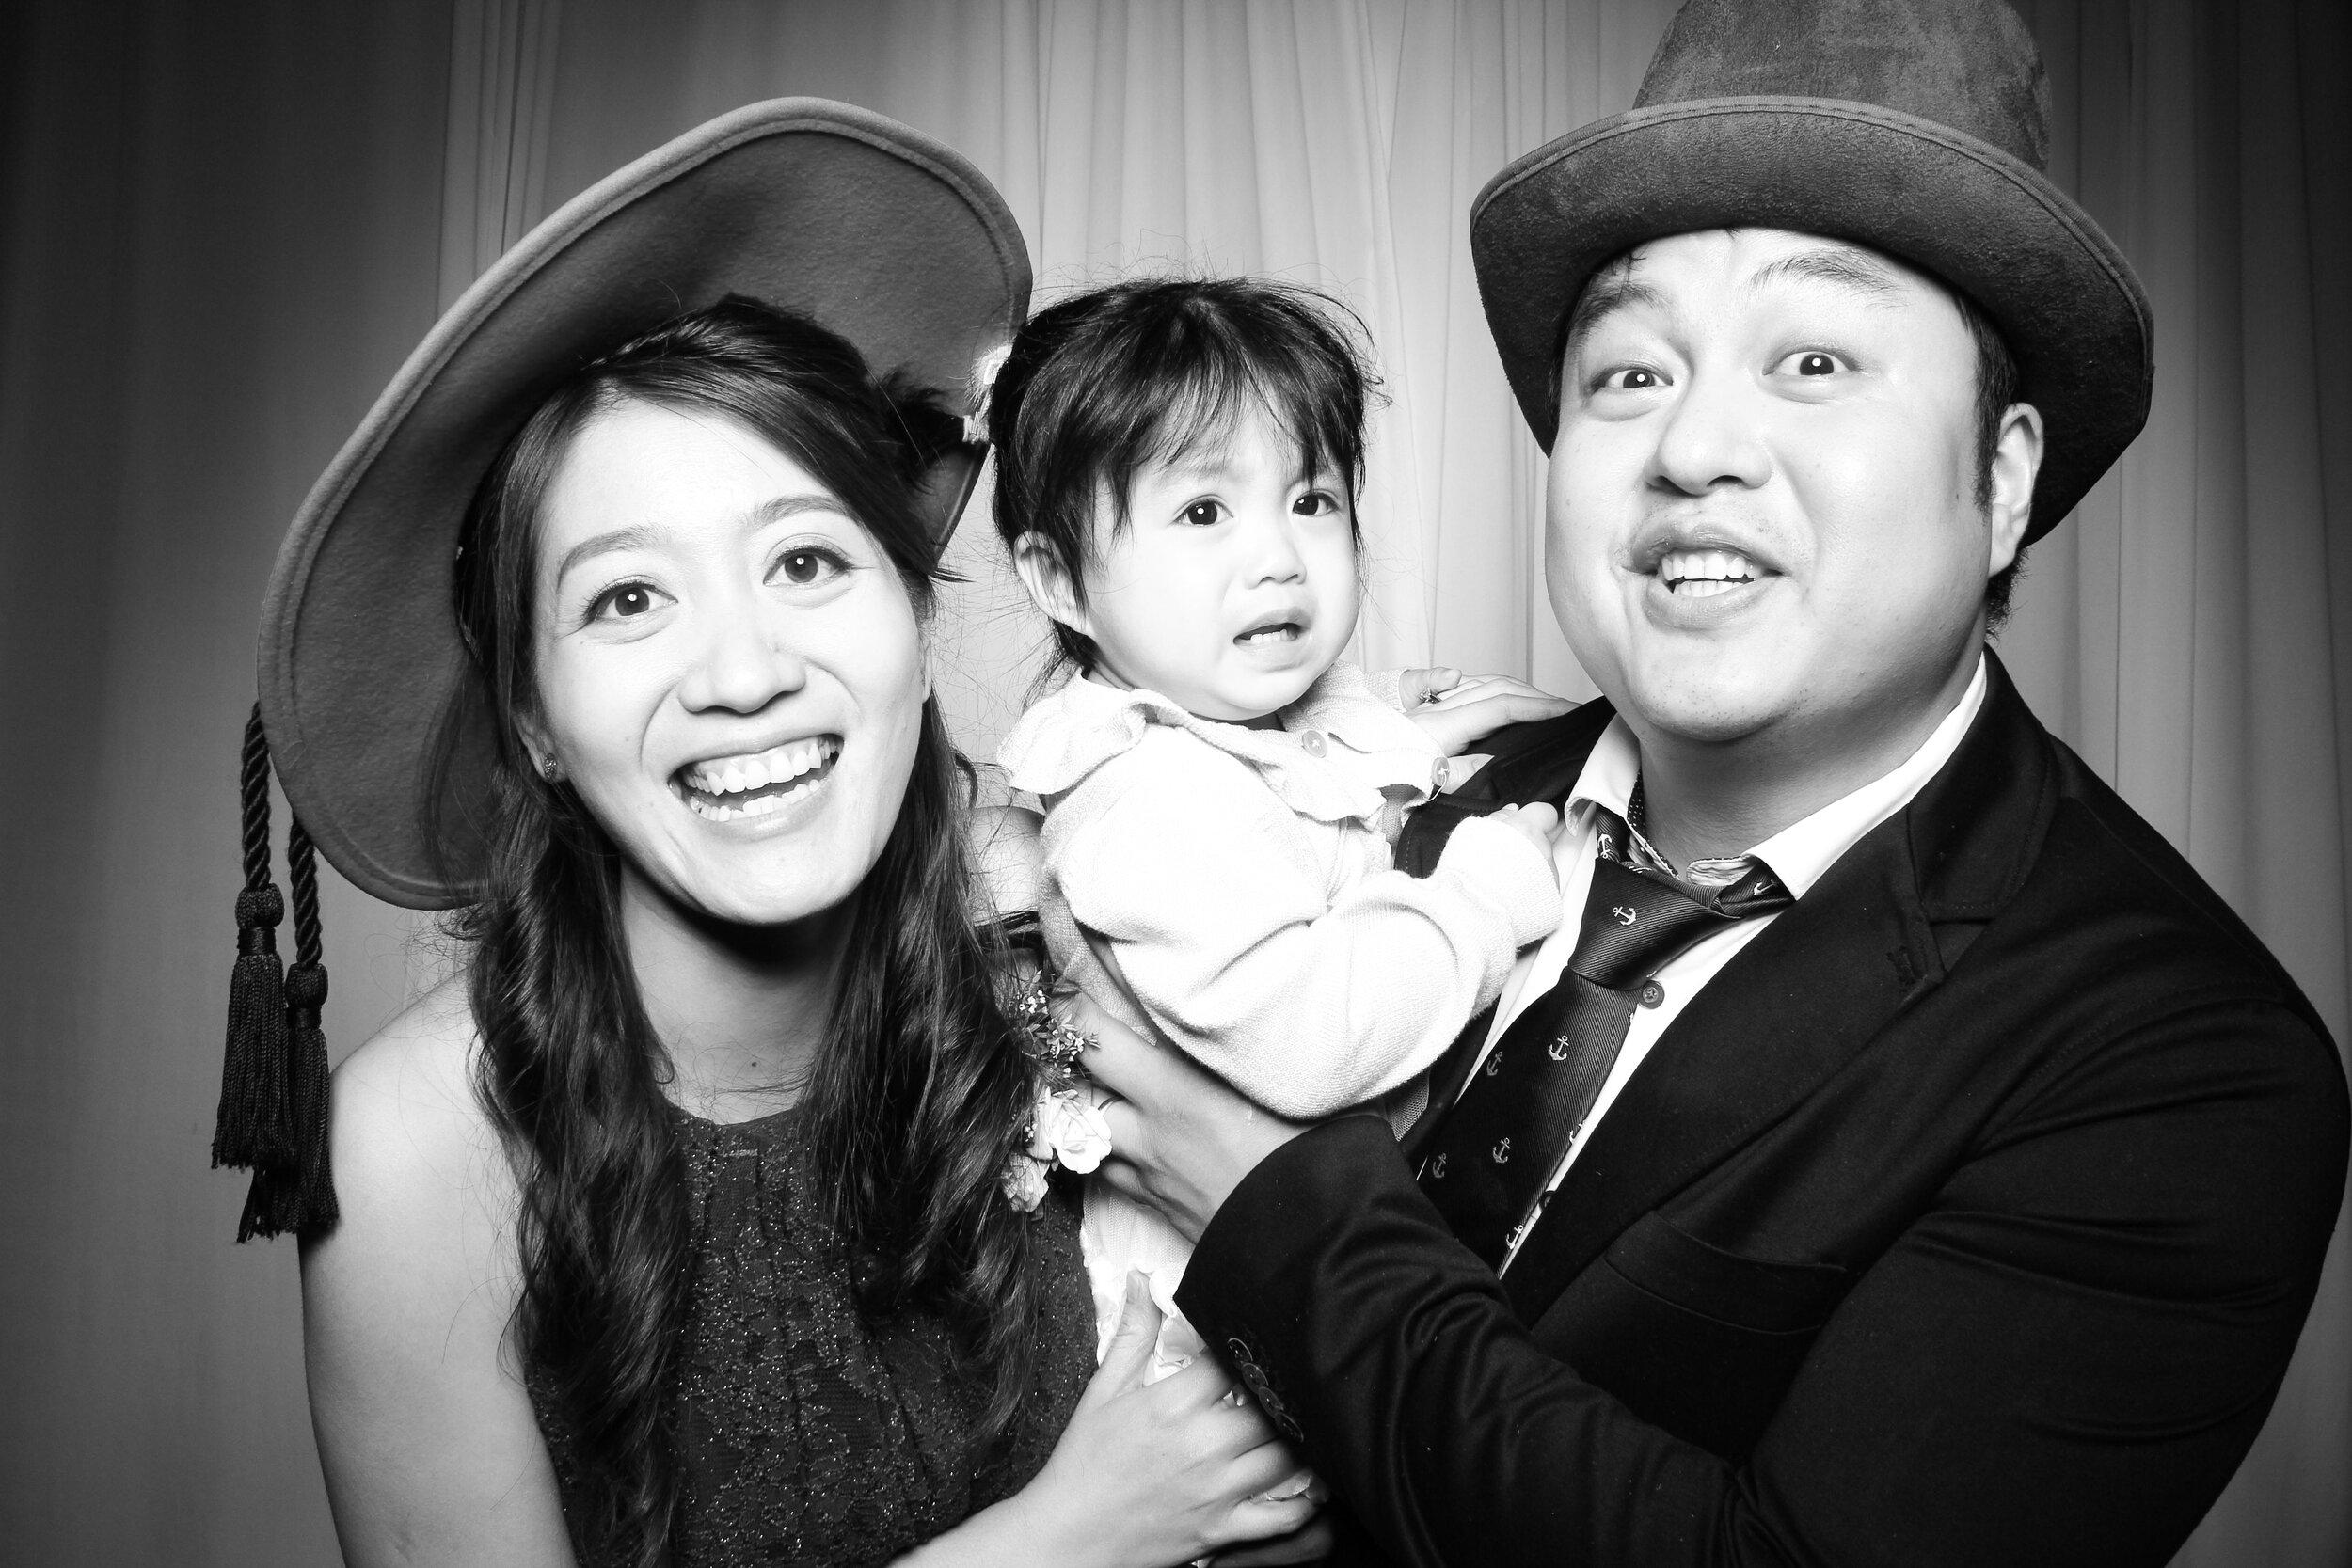 Cai_Restaurant_Chinatown_Chicago_Wedding_Photo_Booth_12.jpg